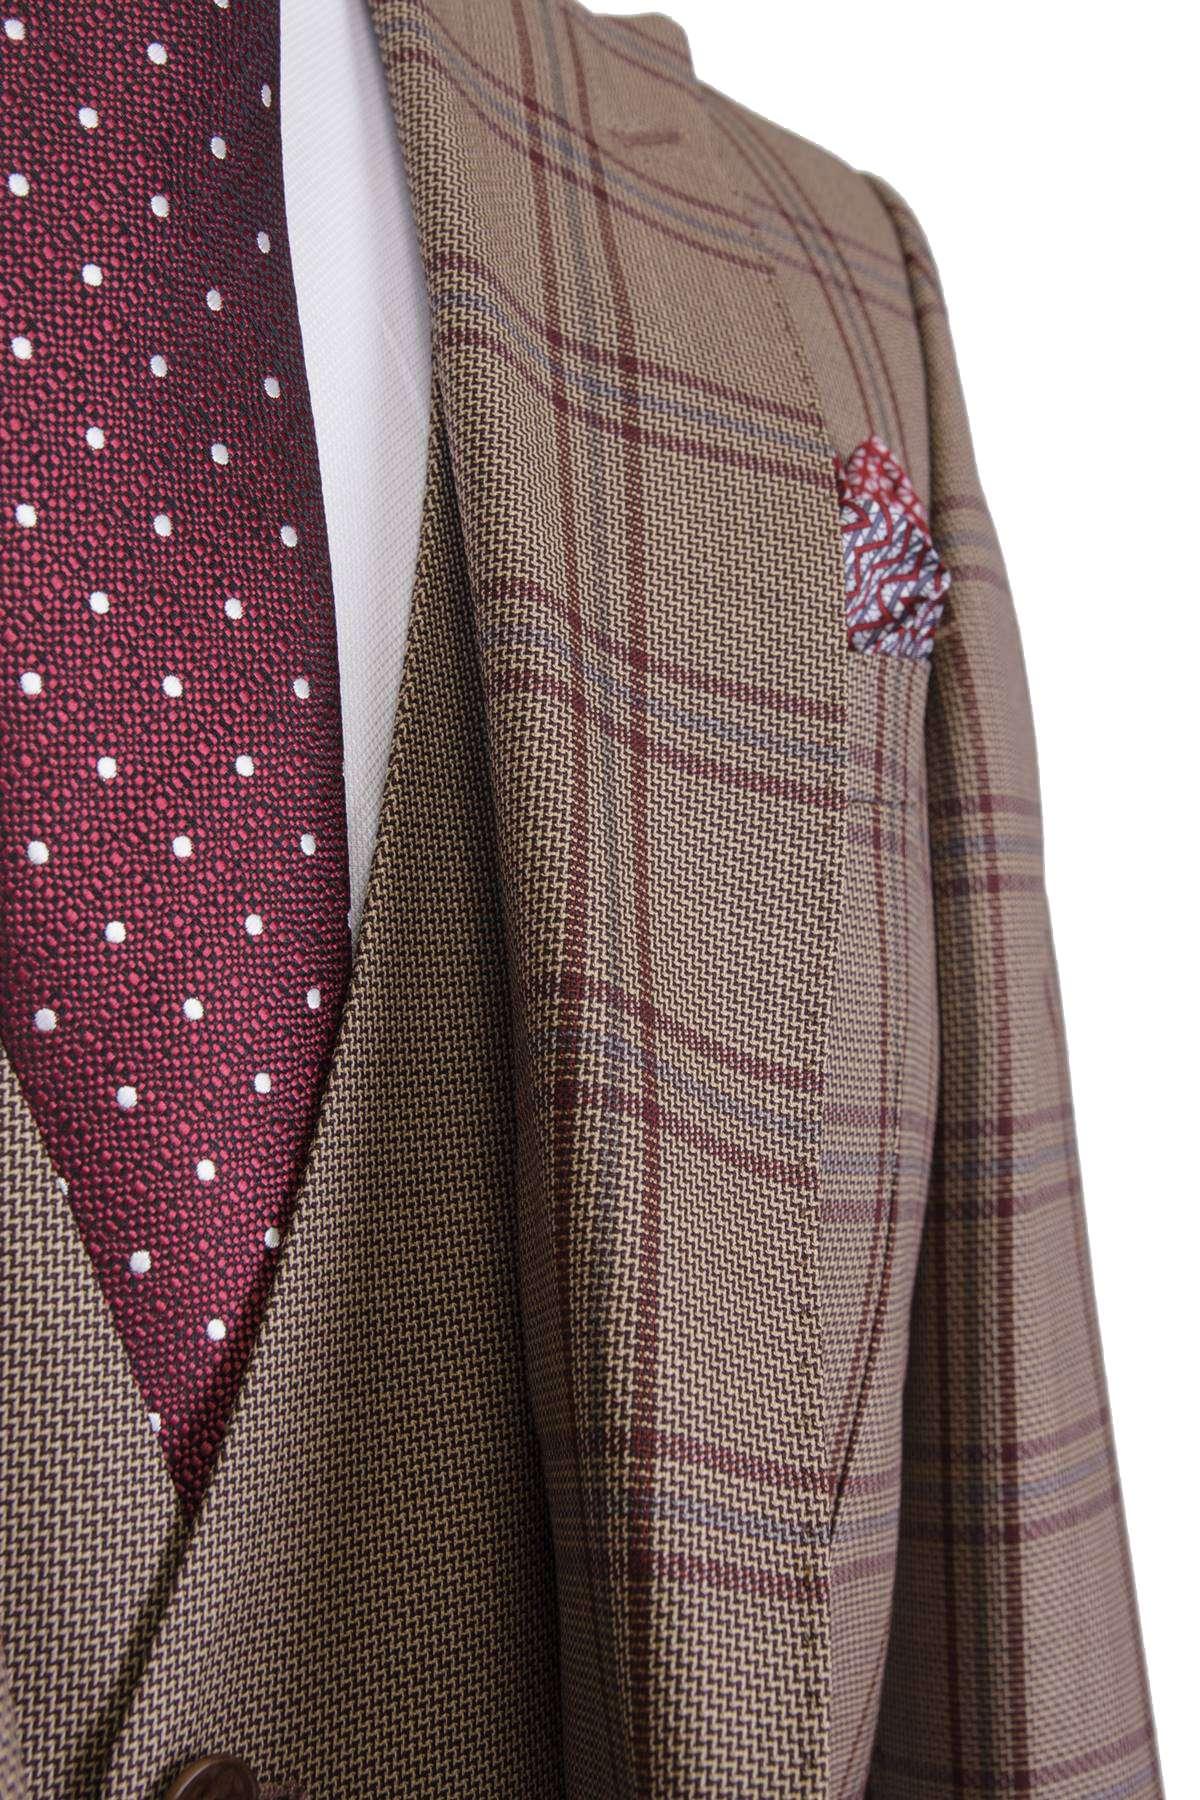 Bespoke Clasic Suit - Carouri